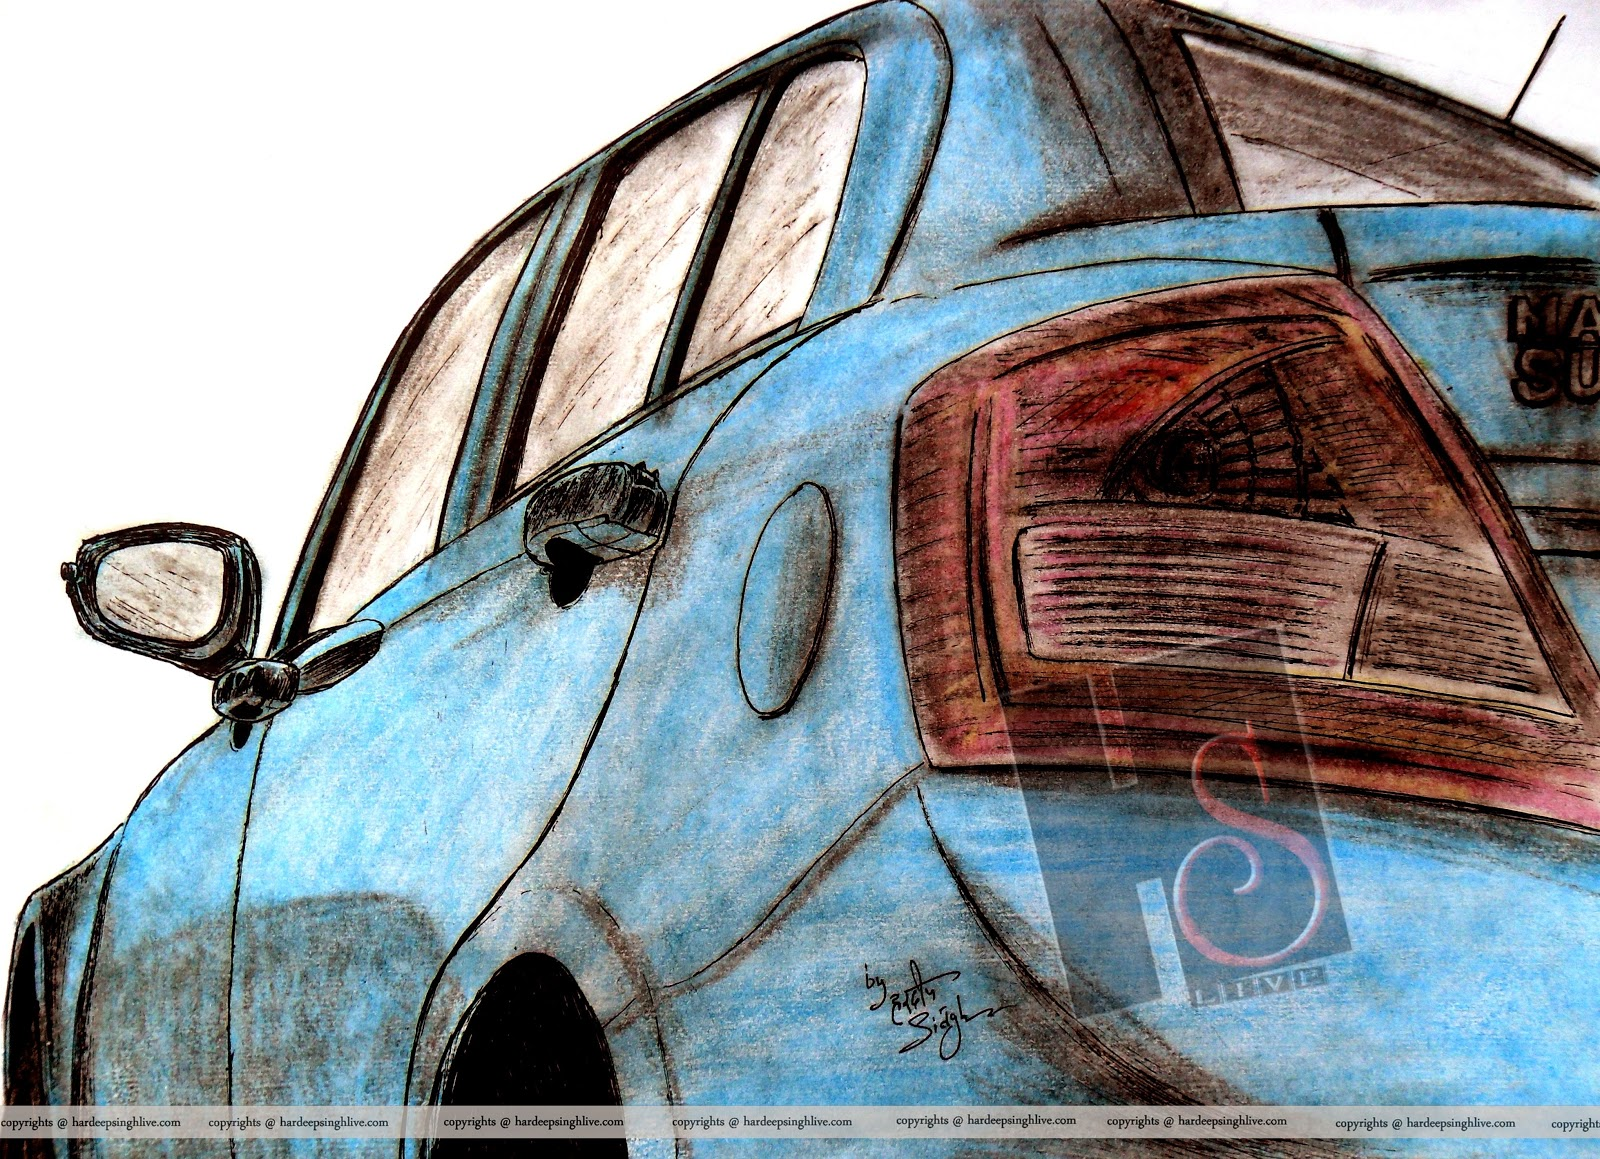 Art Of Hardeep Singh October 2012